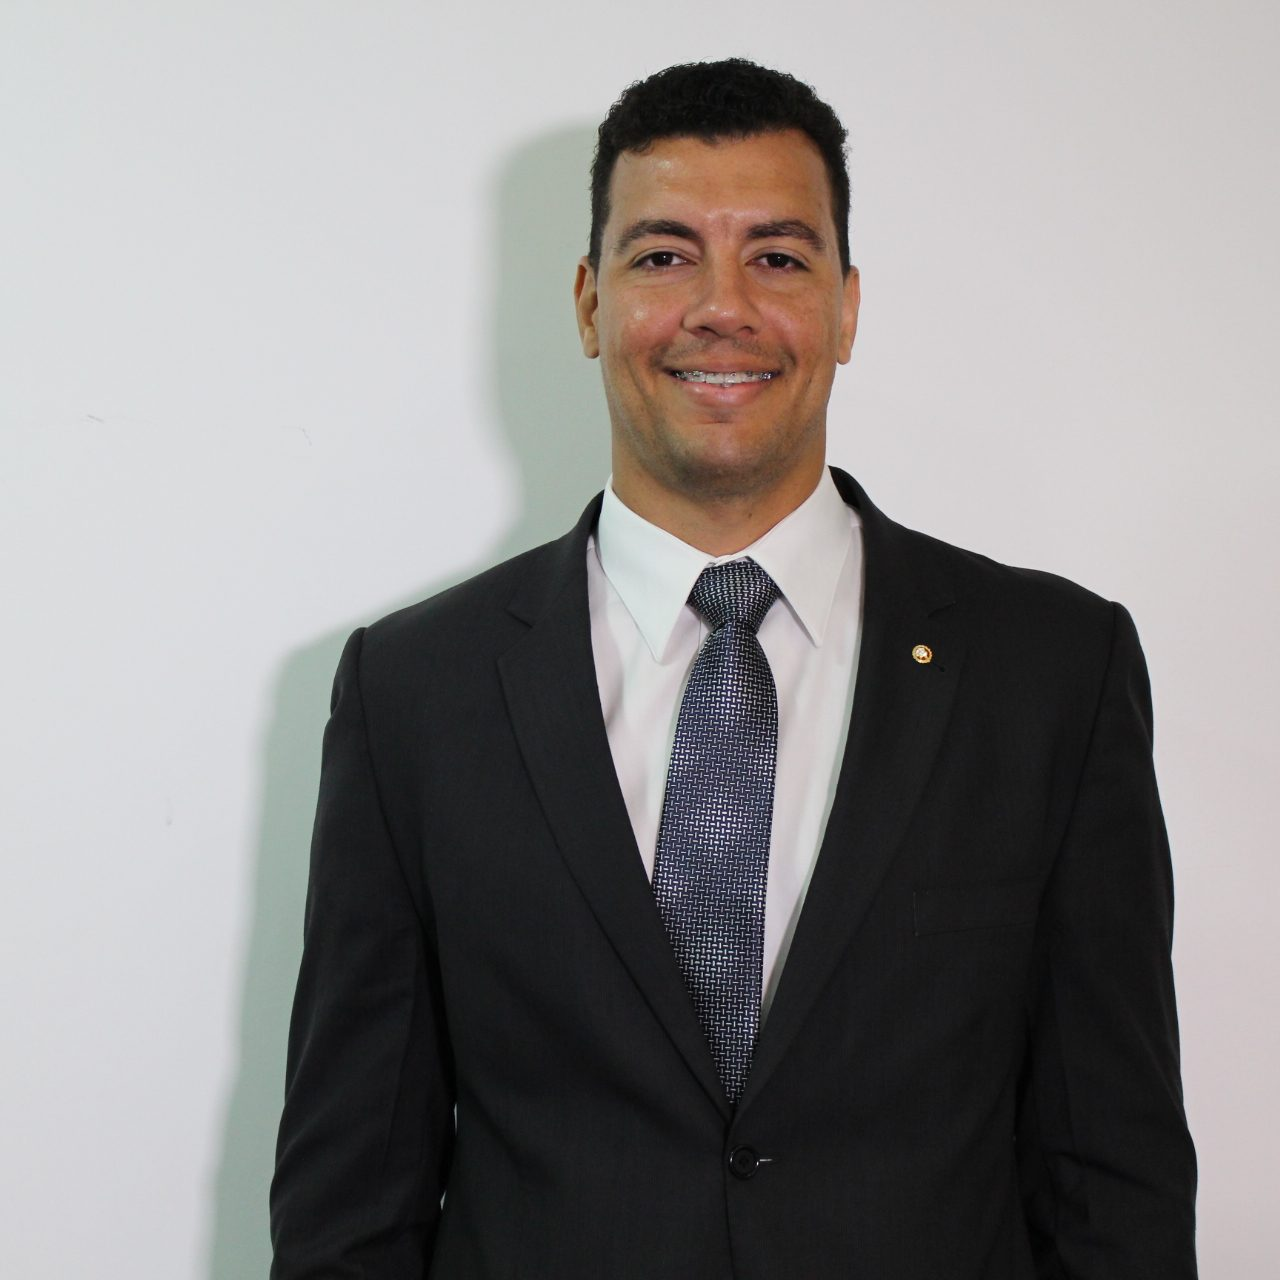 Nathan da Silva Neto